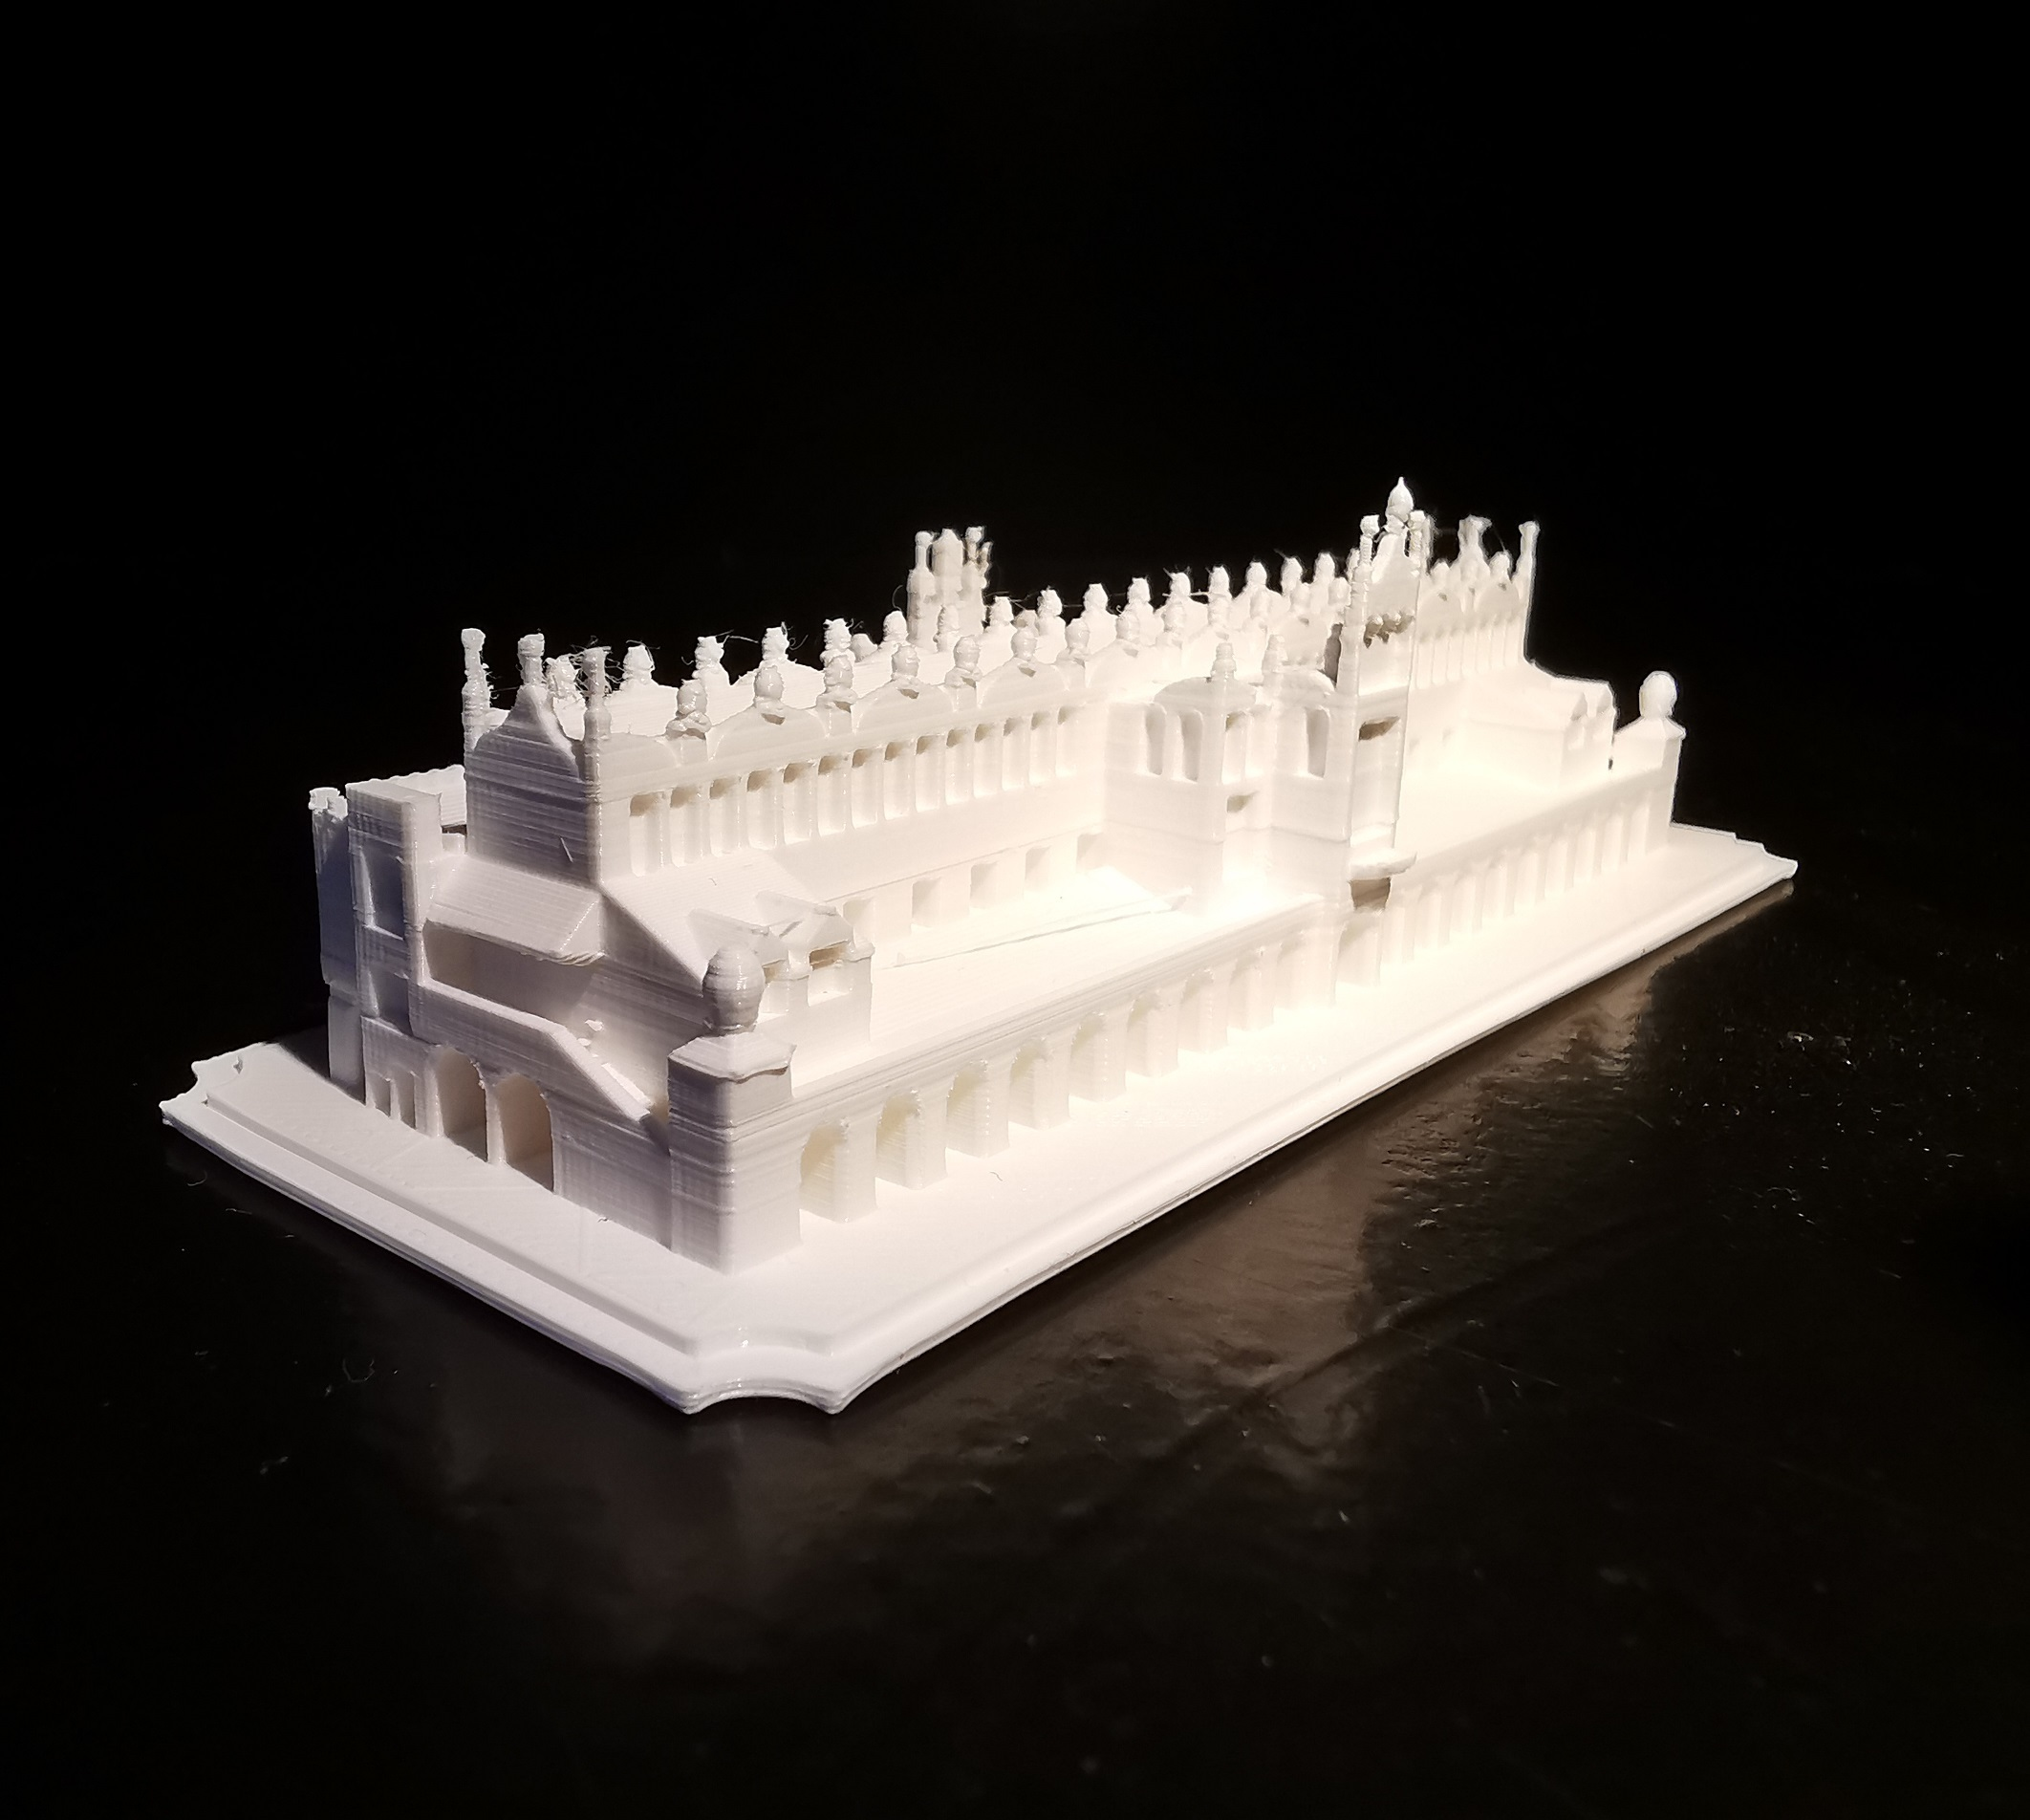 Sukiennice_02.jpg Download STL file Sukiennice - Kraków Cloth Hall • 3D printable design, eAgent